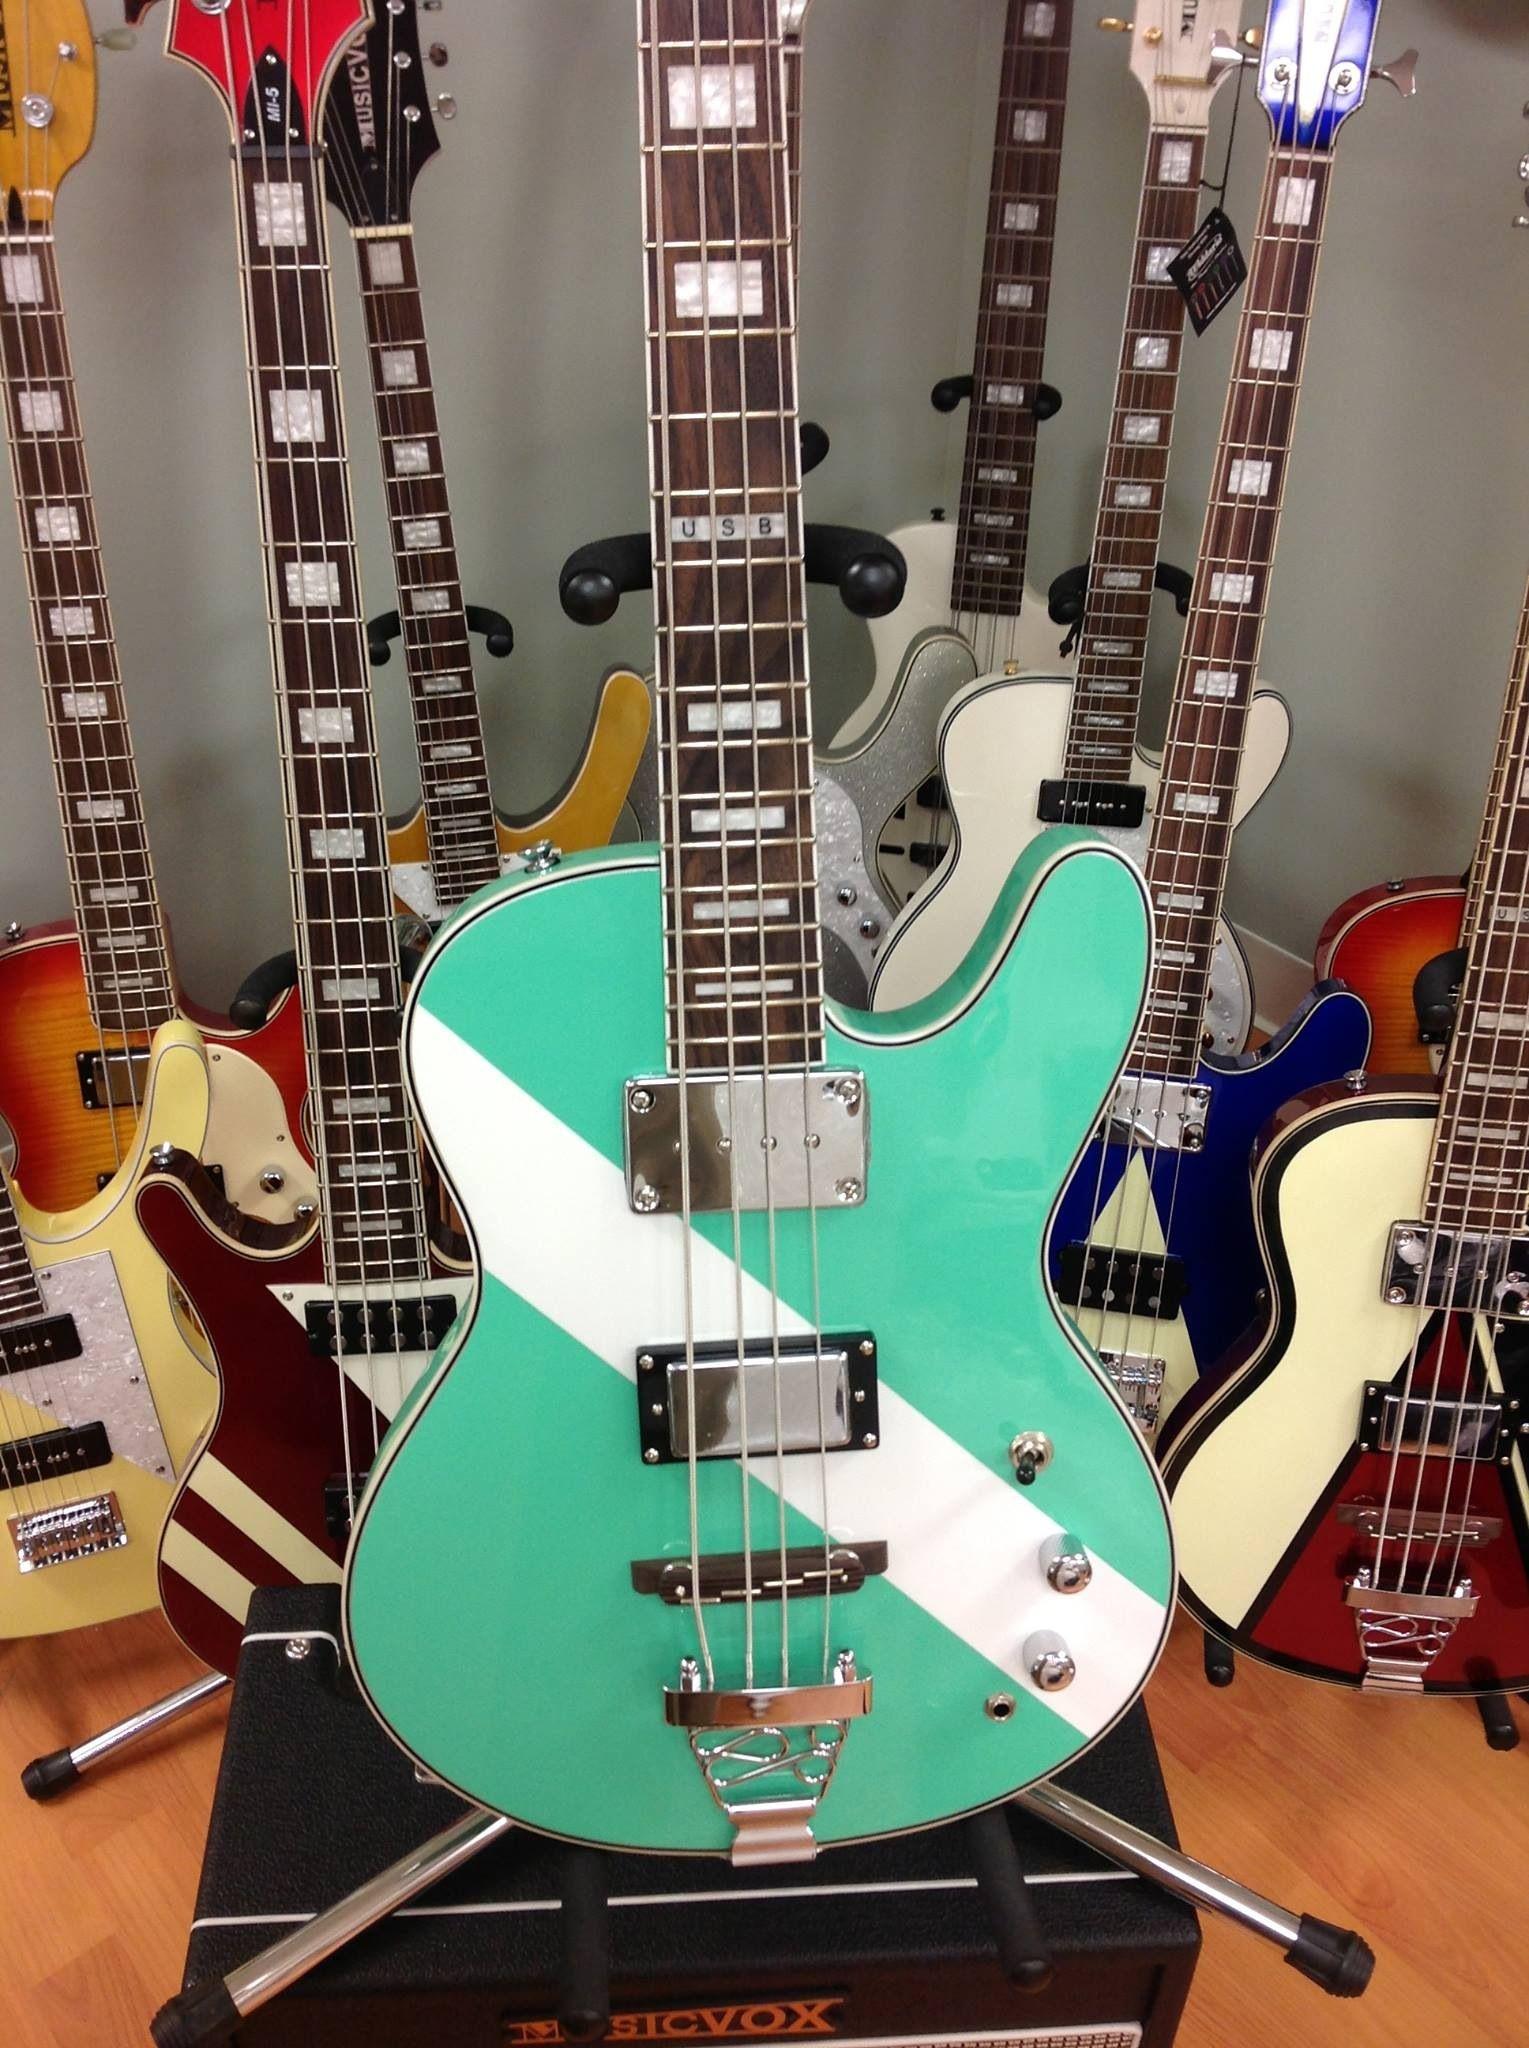 "Musicvox 12 String Space Cadet Bass Allen Woody Cheap Trick 34""Scale Explosive Musicvox Musicvox Guitars & Basses"